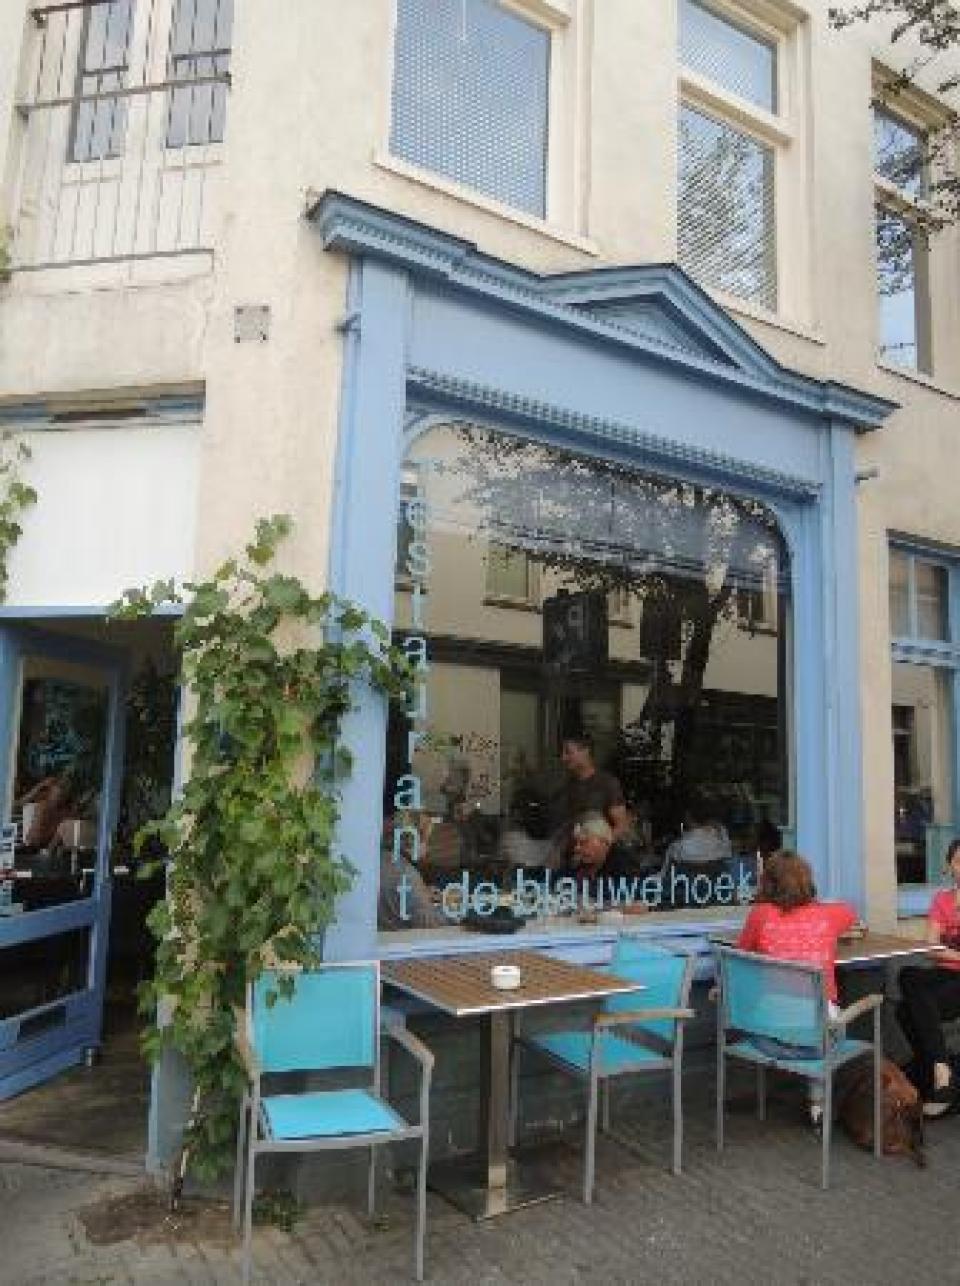 7 x hotspots restaurants in spijkerkwartier arnhem let for Arnhem restaurant